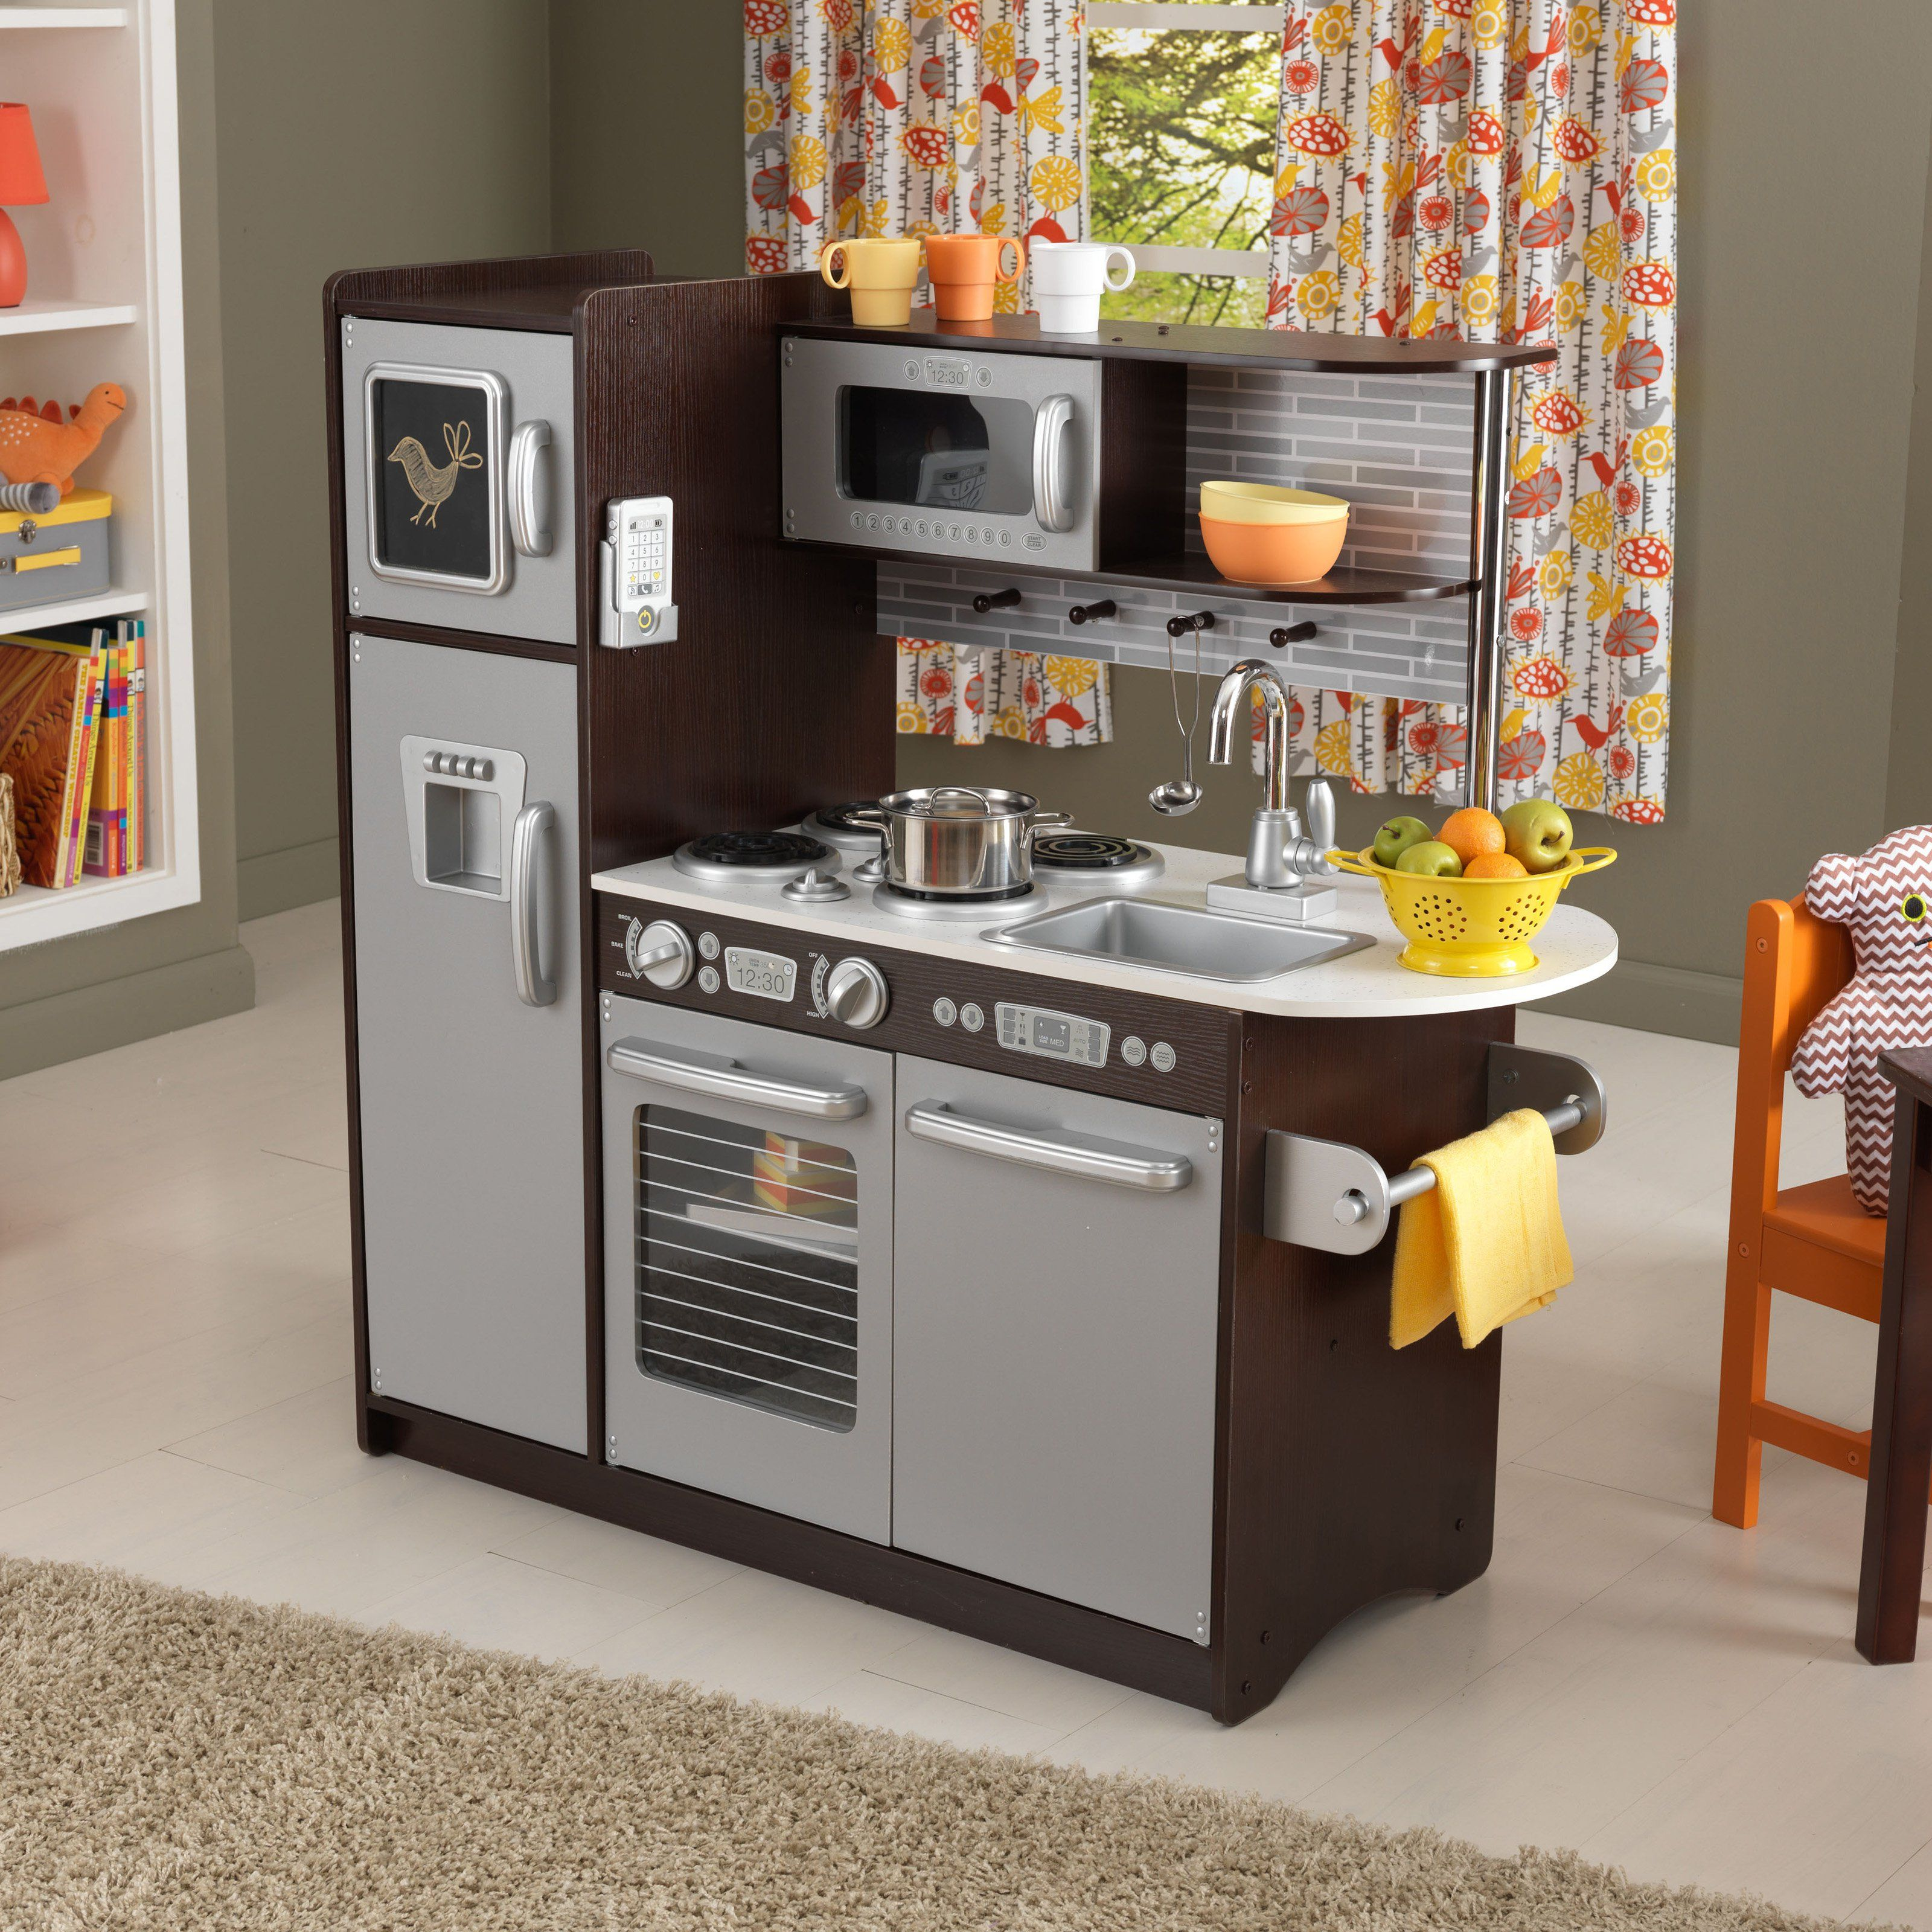 Kidkraft large pastel kitchen  KidKraft Uptown Espresso Play Kitchen      Products